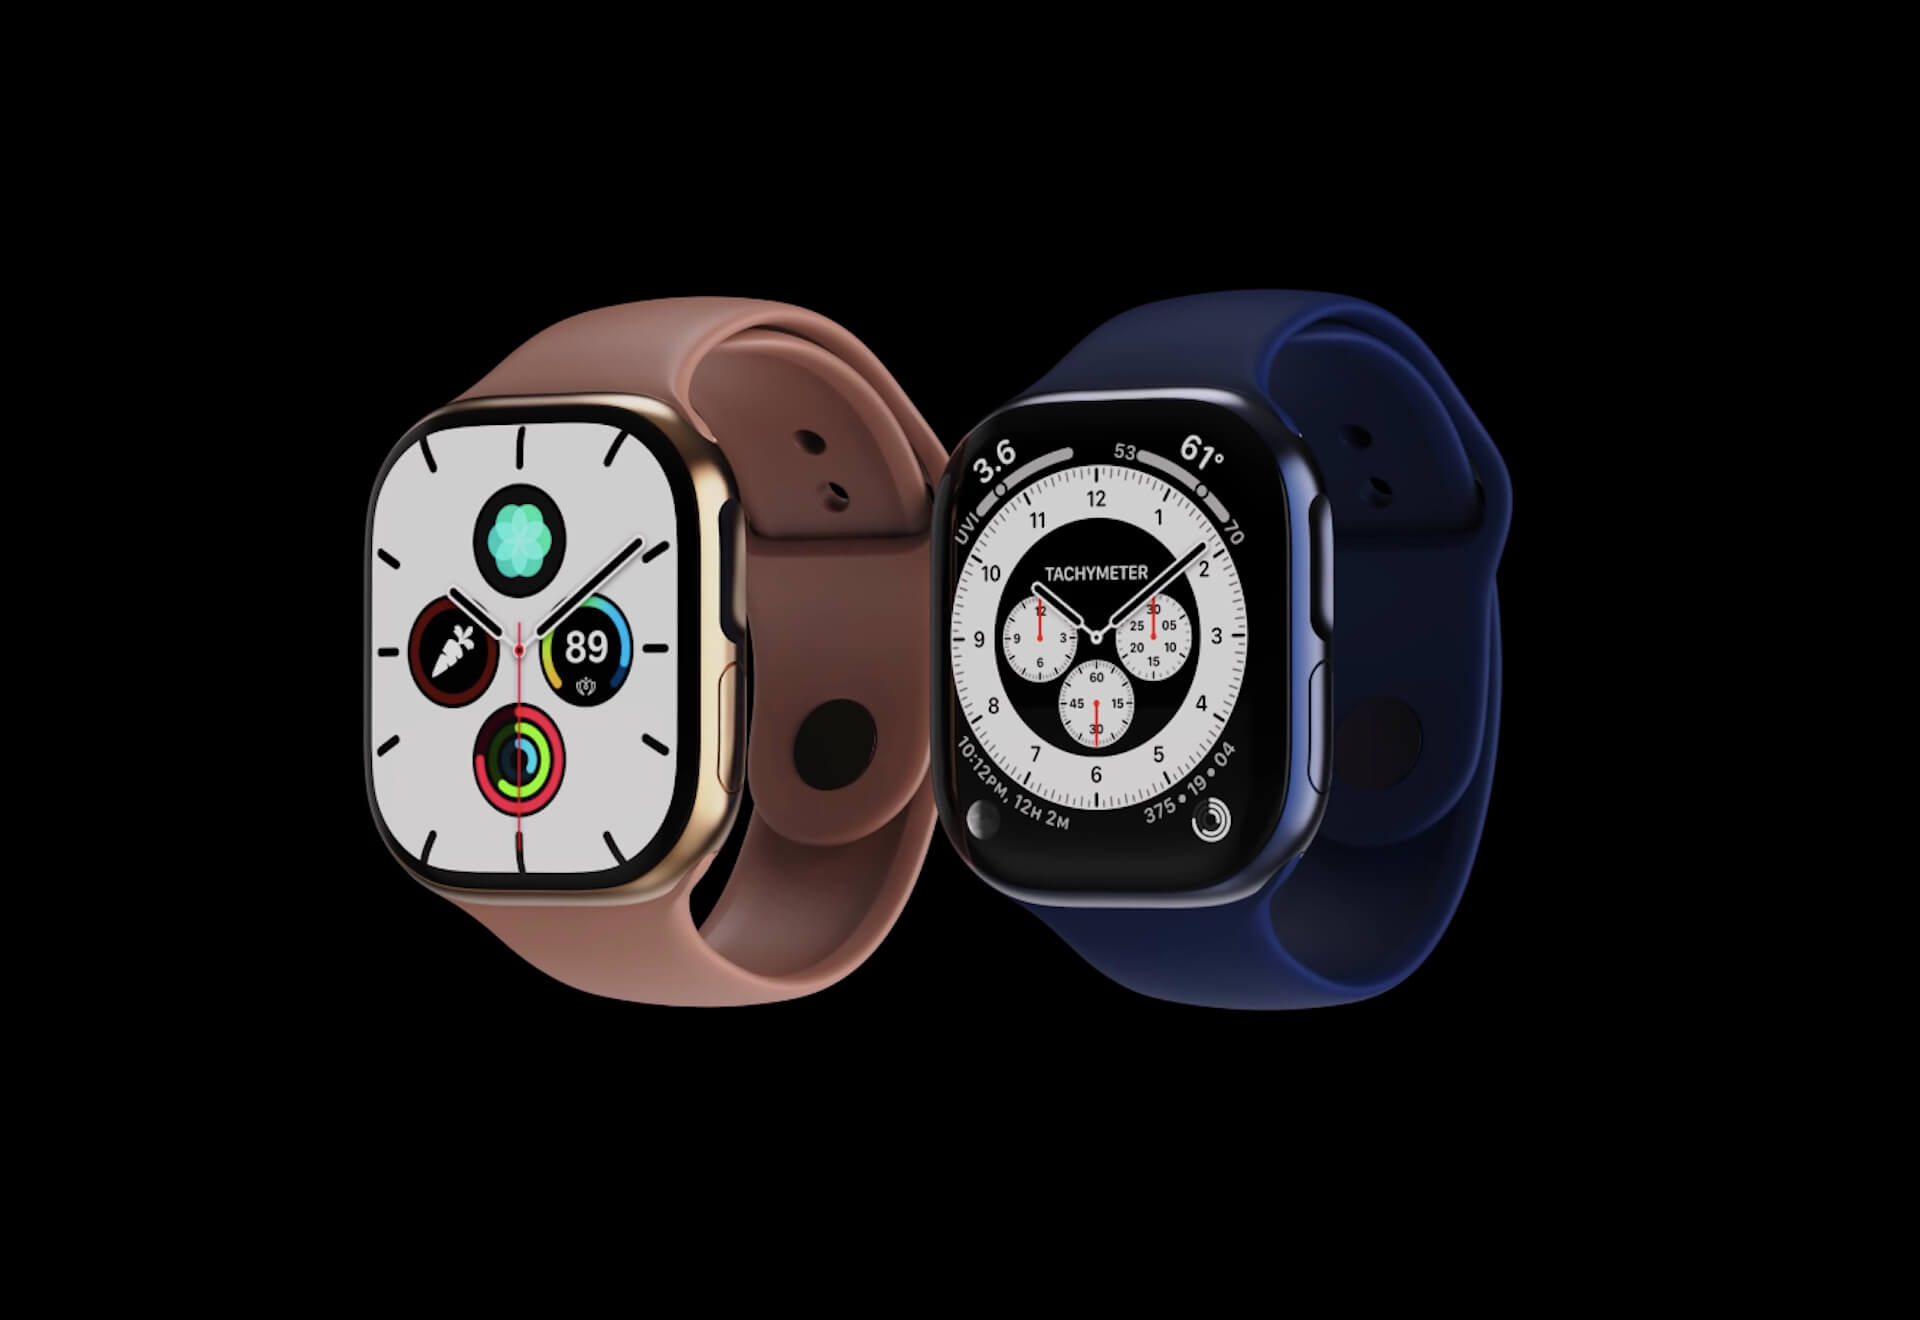 Apple Watch Series 6、やはり発表間近!?公式サイトで一部モデルが発送に遅れ tech200831_applewatch_main